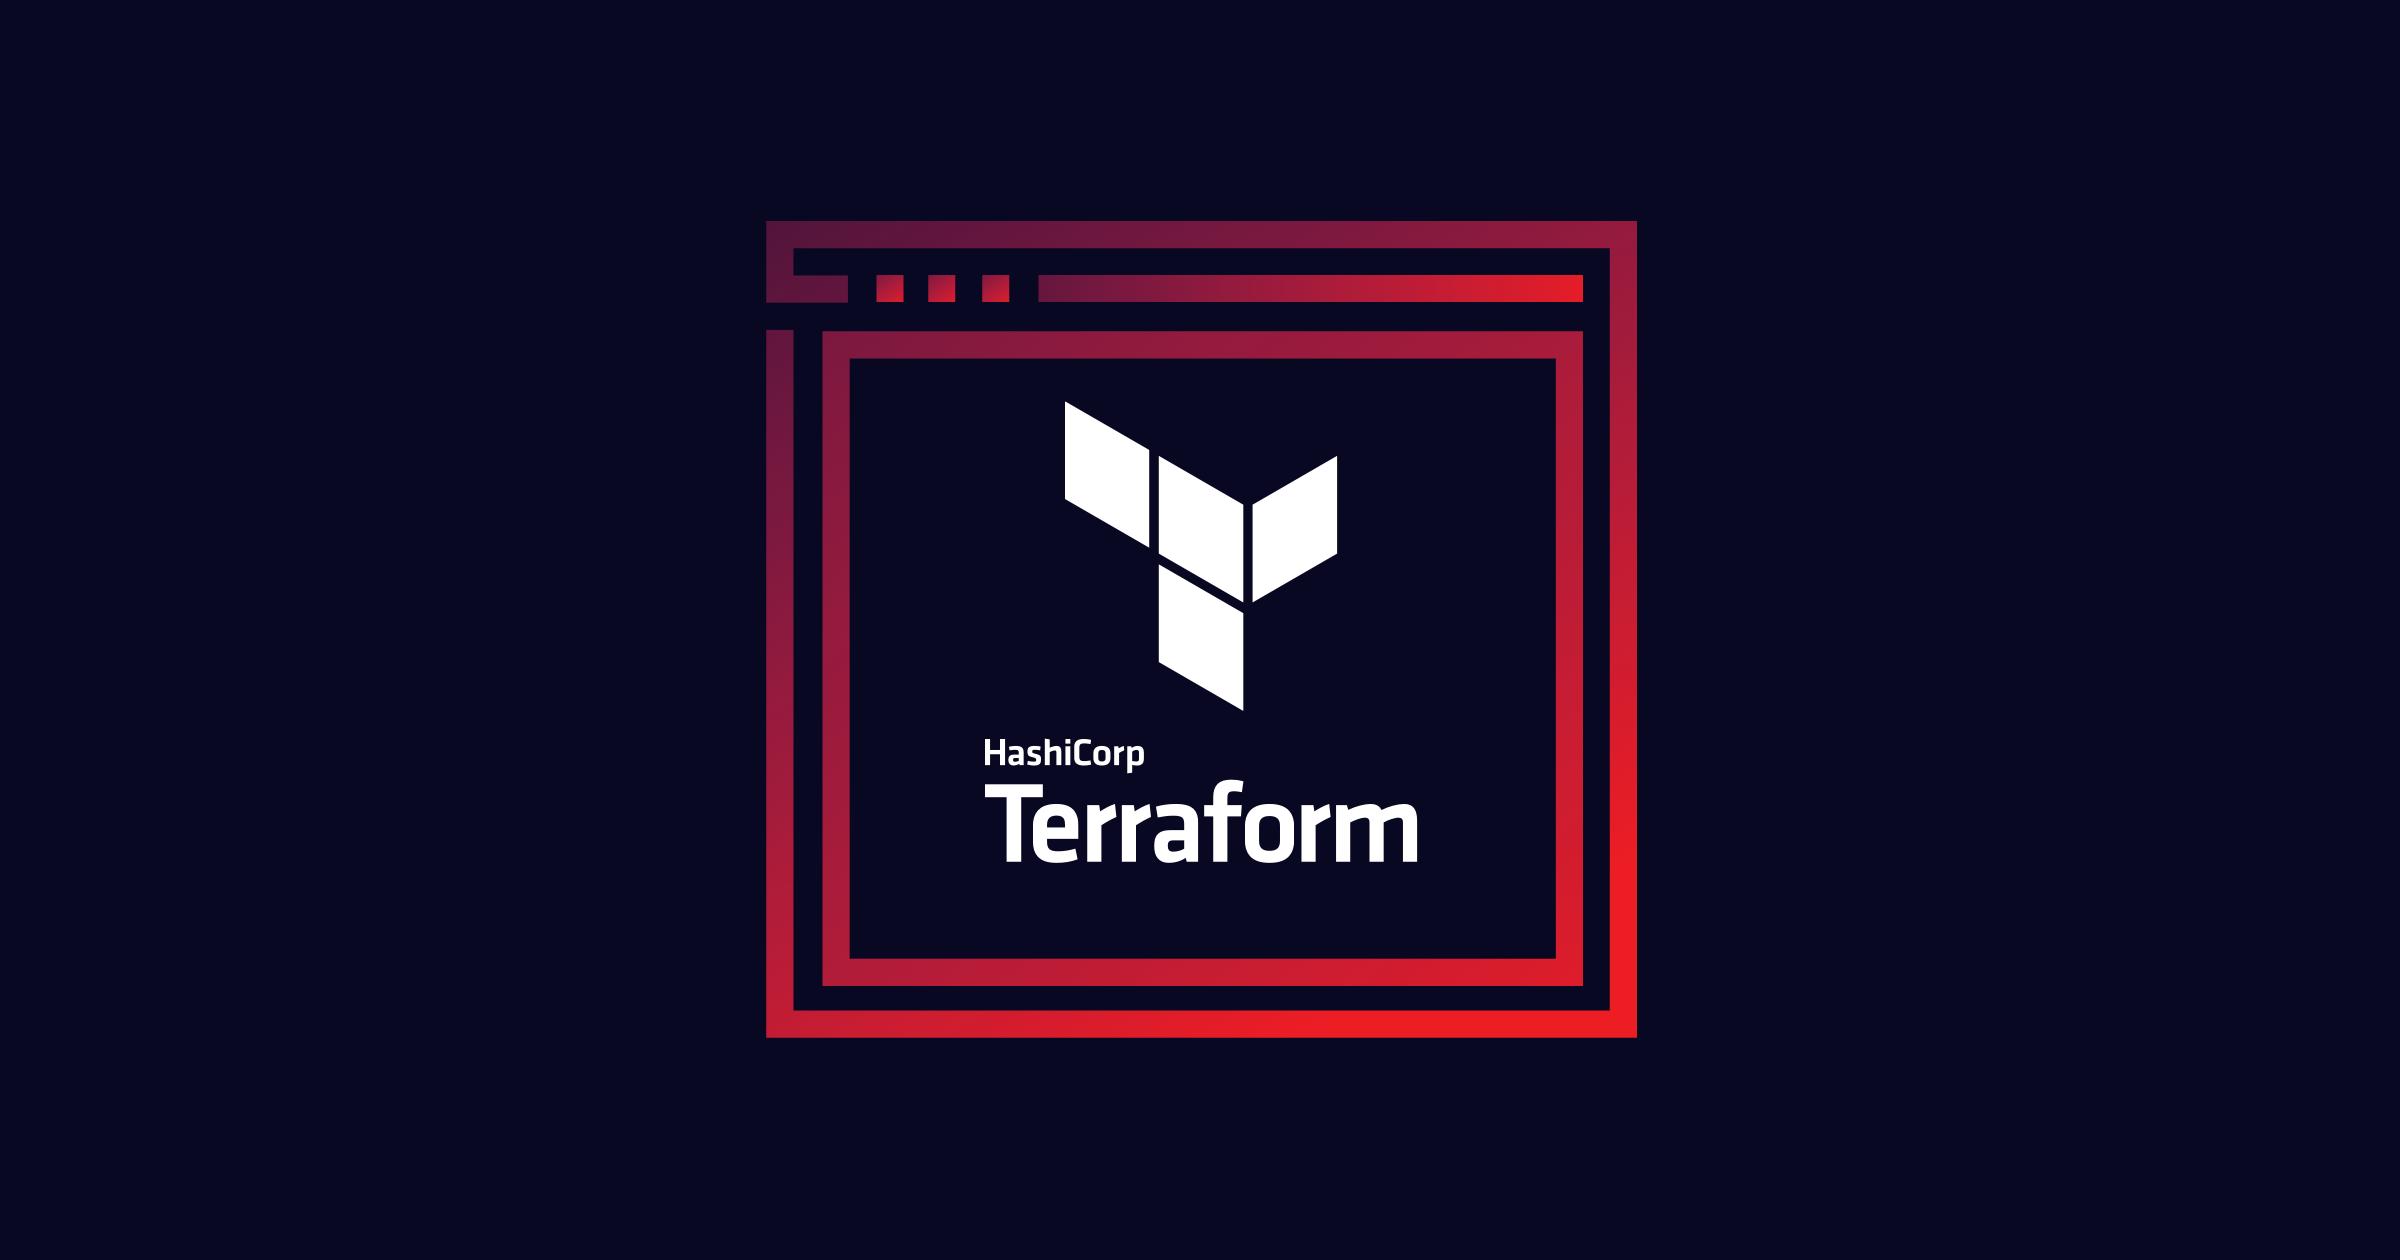 Megaport Terraform Infrastructure as Code